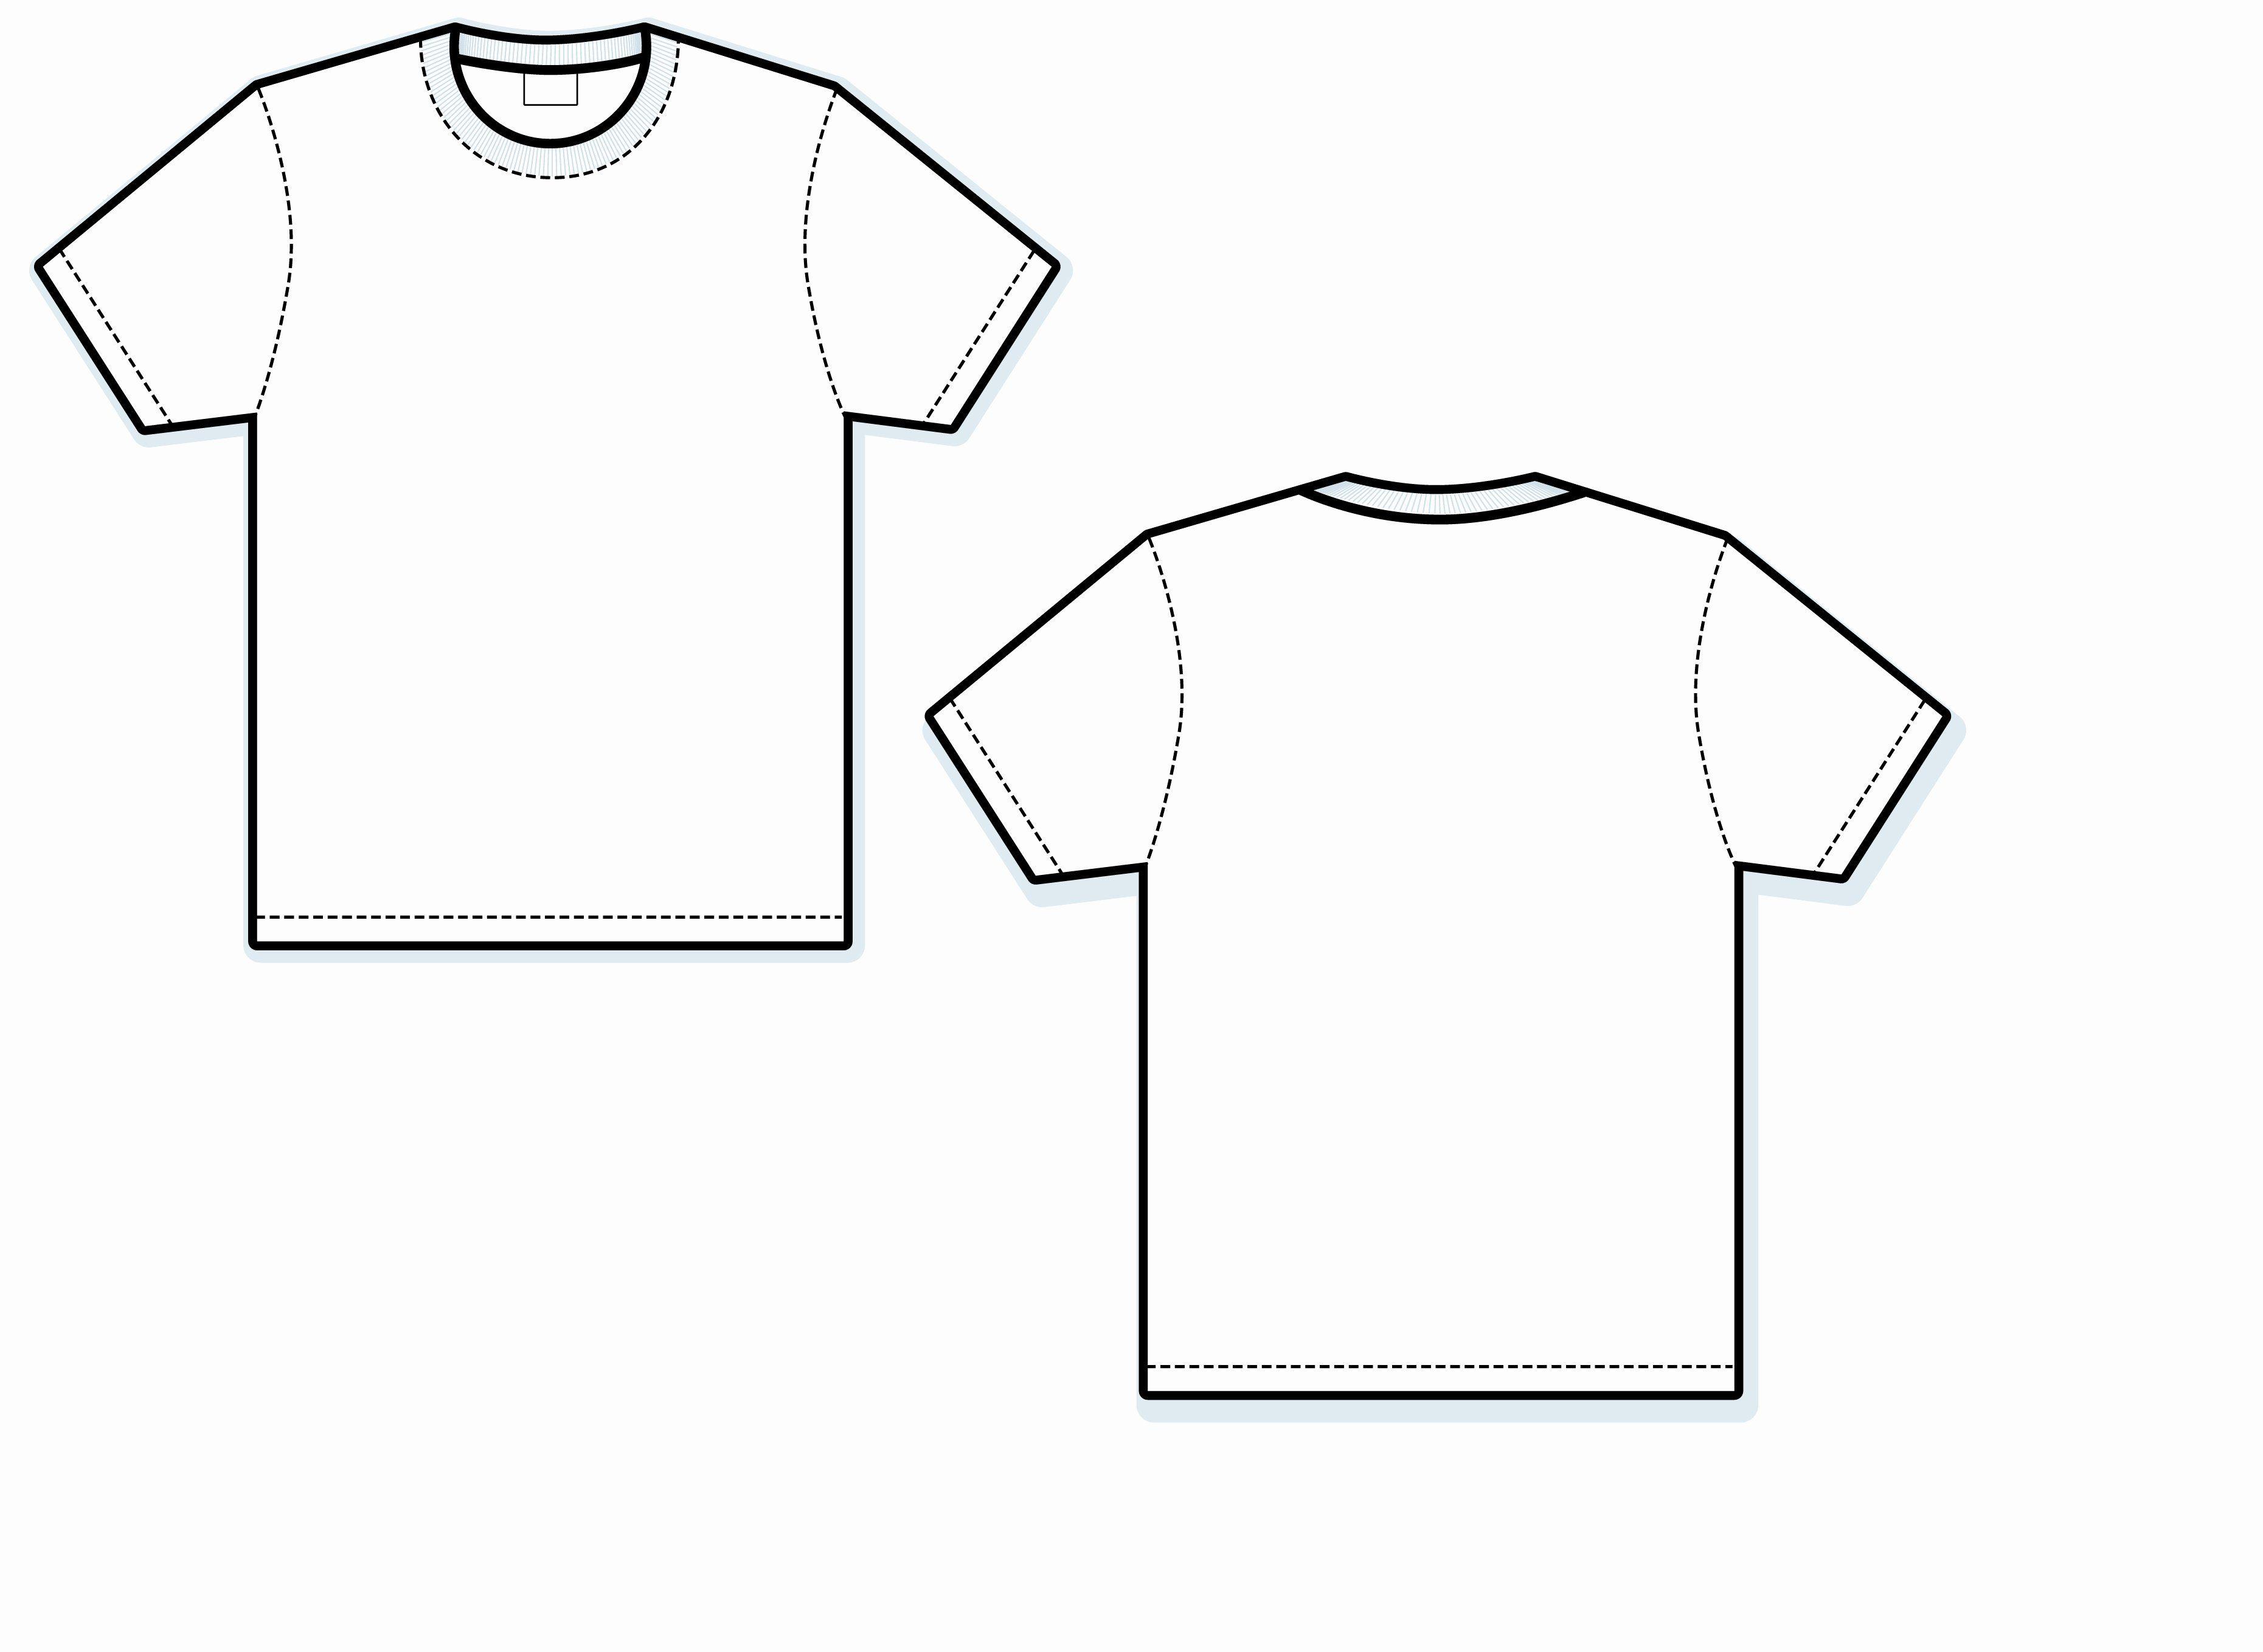 Download Blank Tshirt Template Beautiful Free Blank T Shirt Download Free Clip Art Free Clip Art T Shirt Design Template Blank T Shirts Tshirt Template